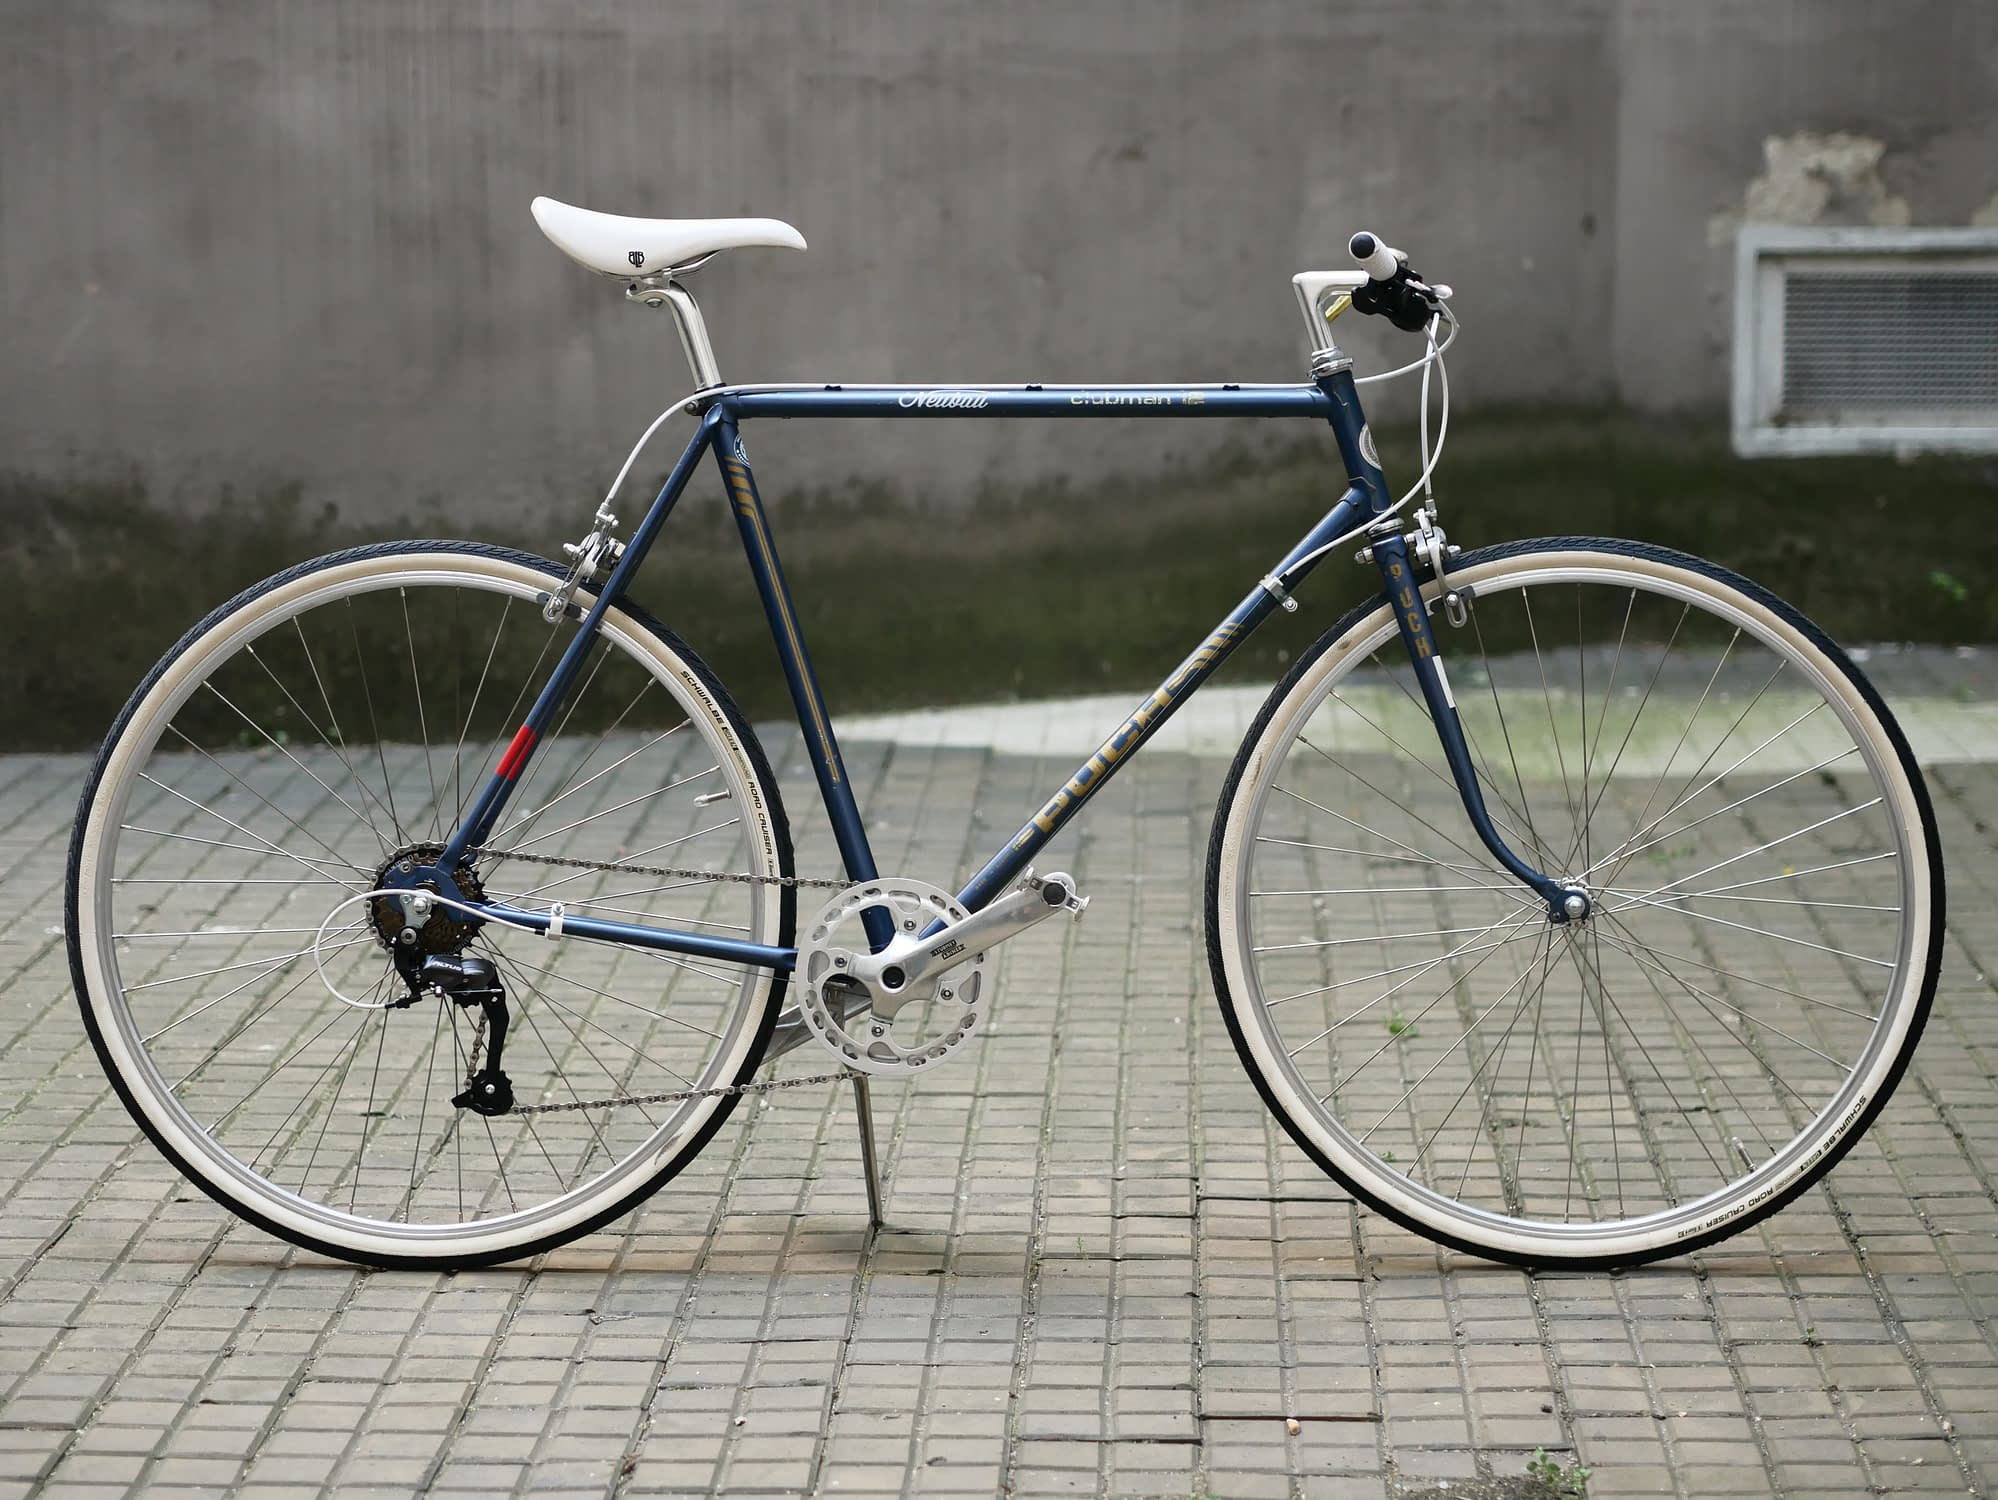 P1140269 scaled - Puch Clubman 12 Dunkelblau